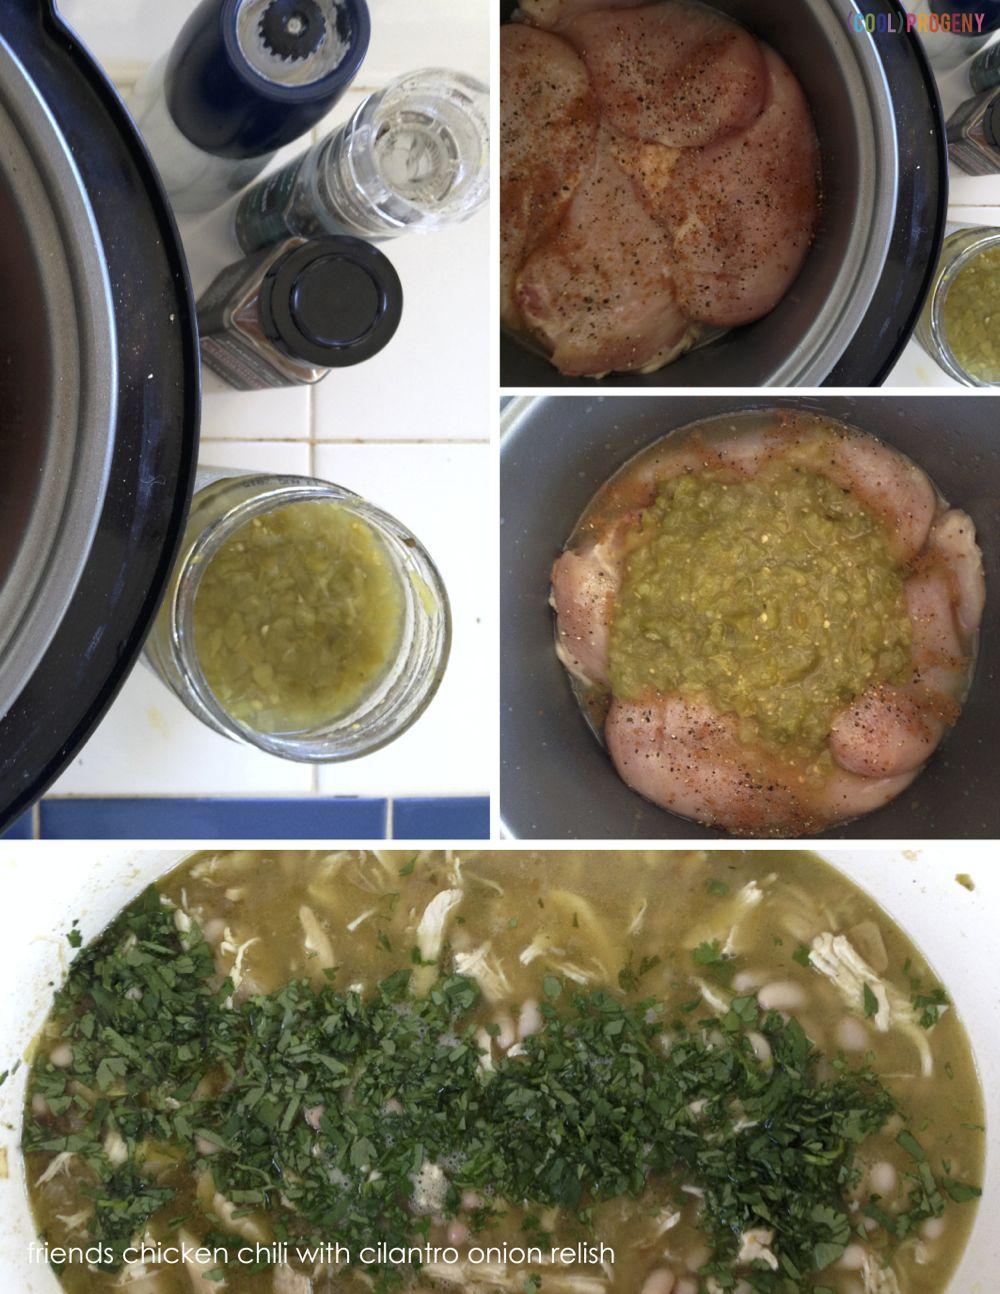 Friends Chicken Chili with Cilantro Onion Relish - (cool) progeny